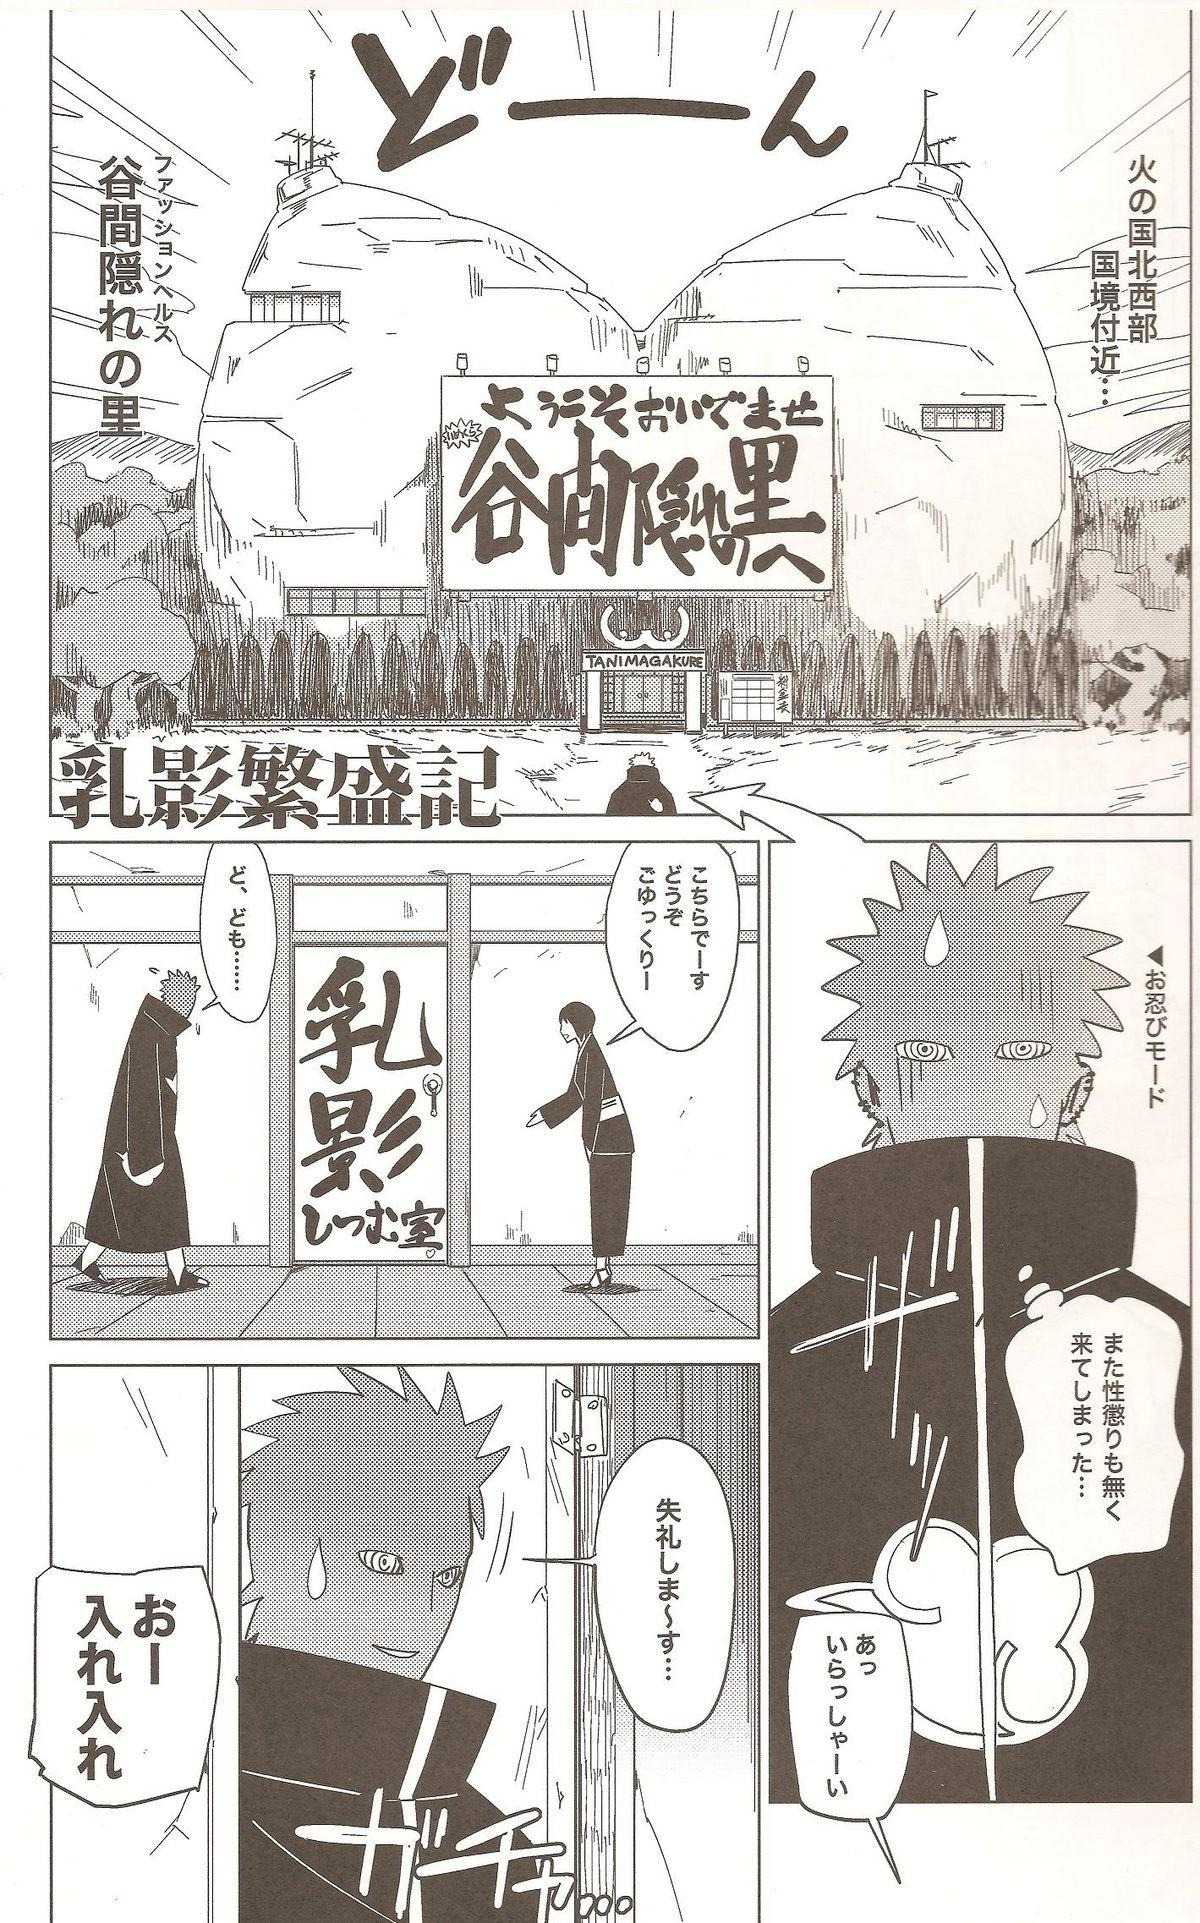 AbRAdEli kAMiTAbA No. 01 Chichikage Hanjouki 1